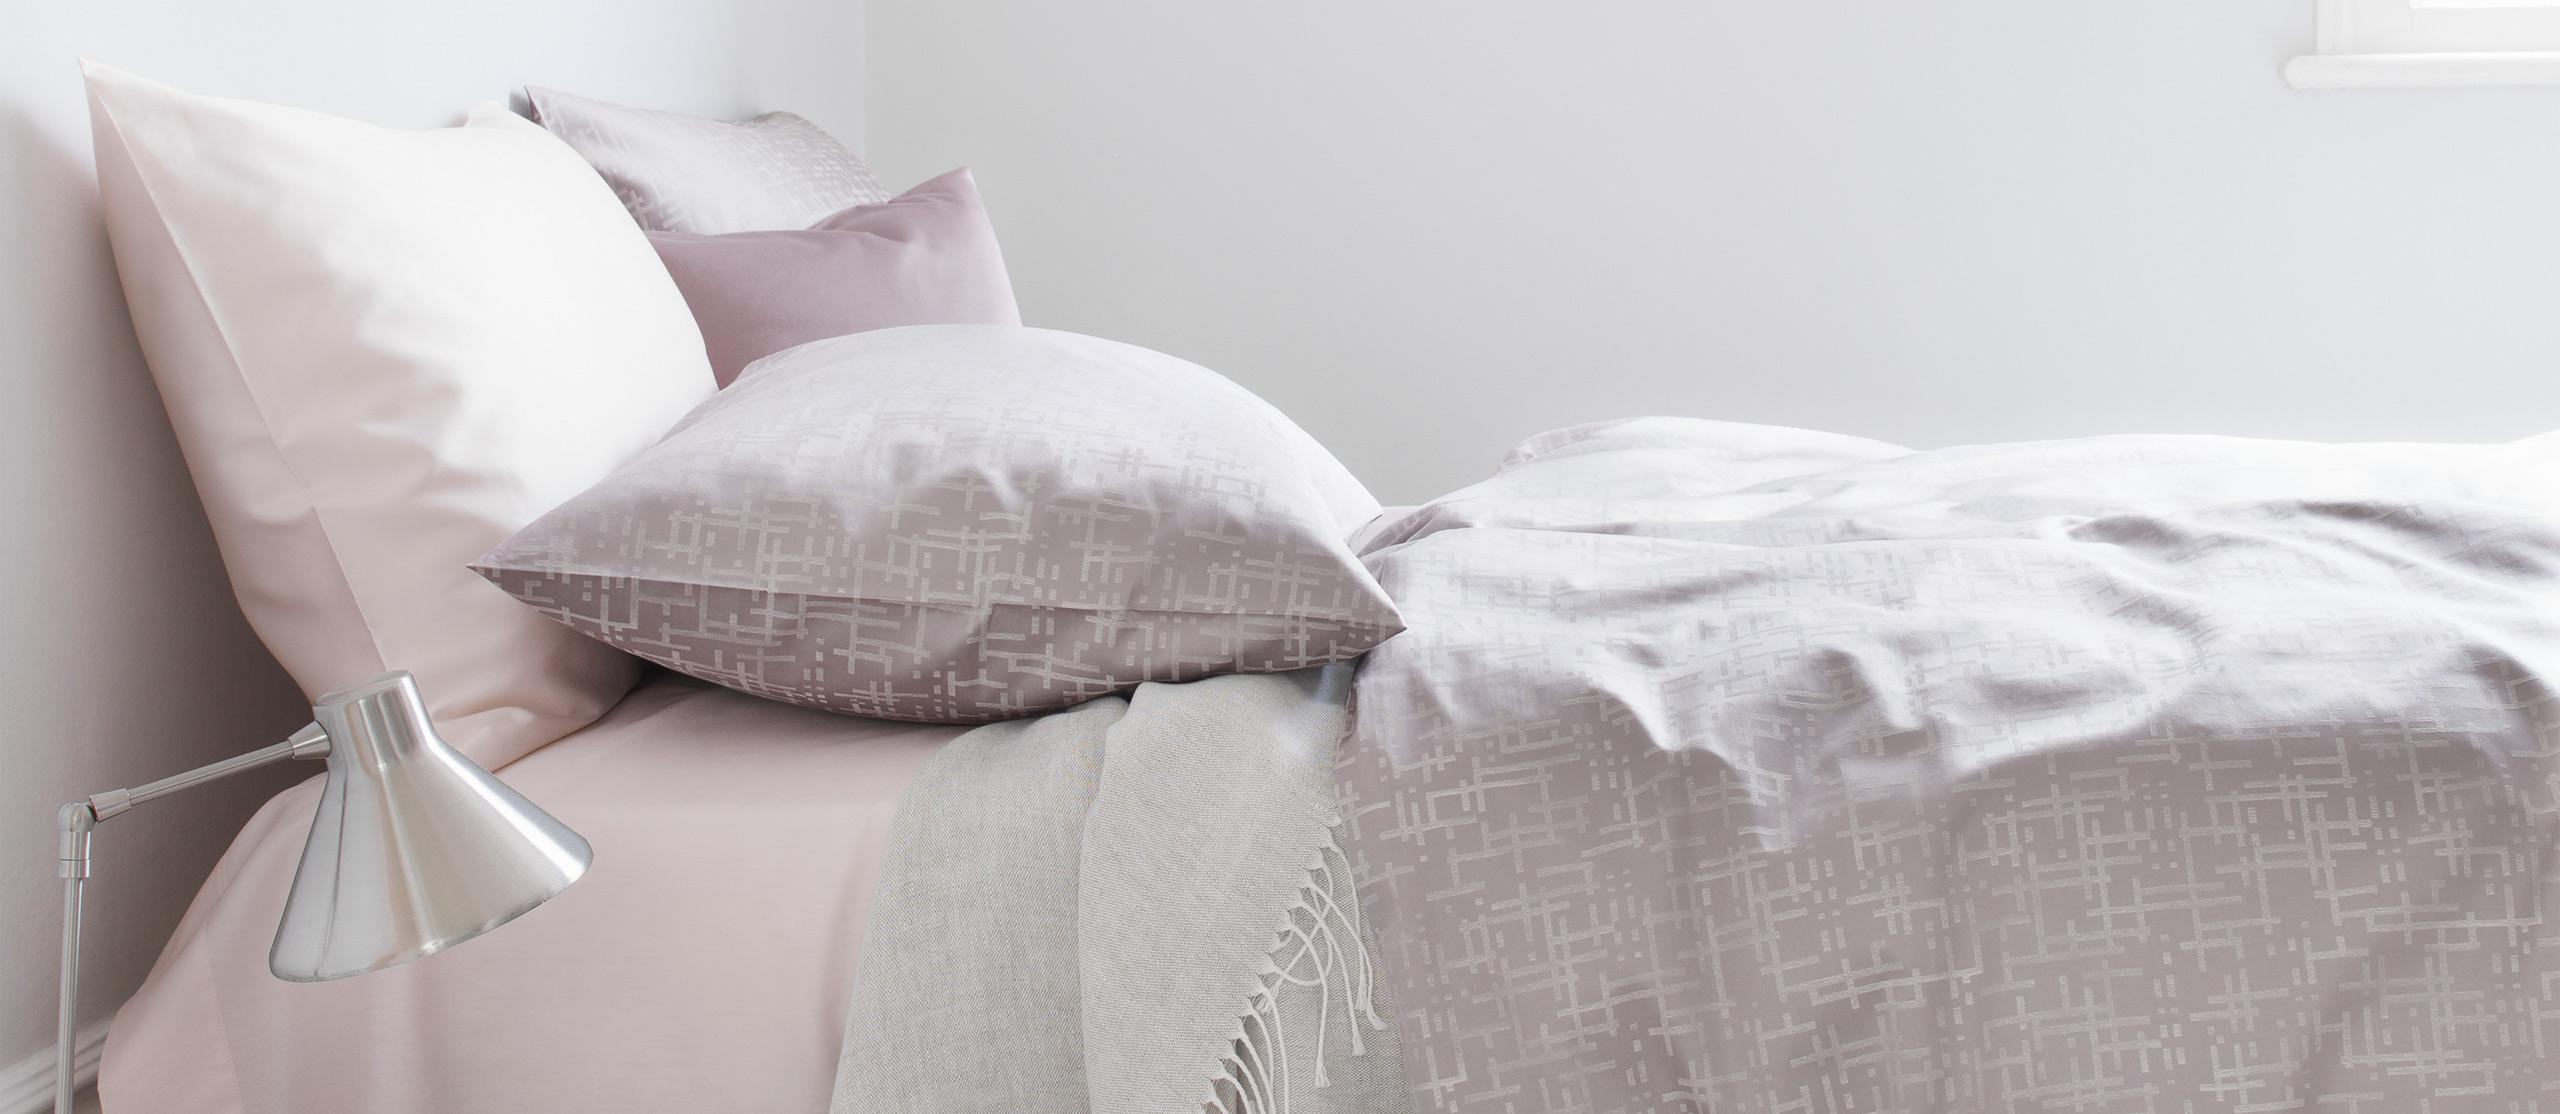 bettenhaus uwe heintzen betten matratzen lattenroste. Black Bedroom Furniture Sets. Home Design Ideas